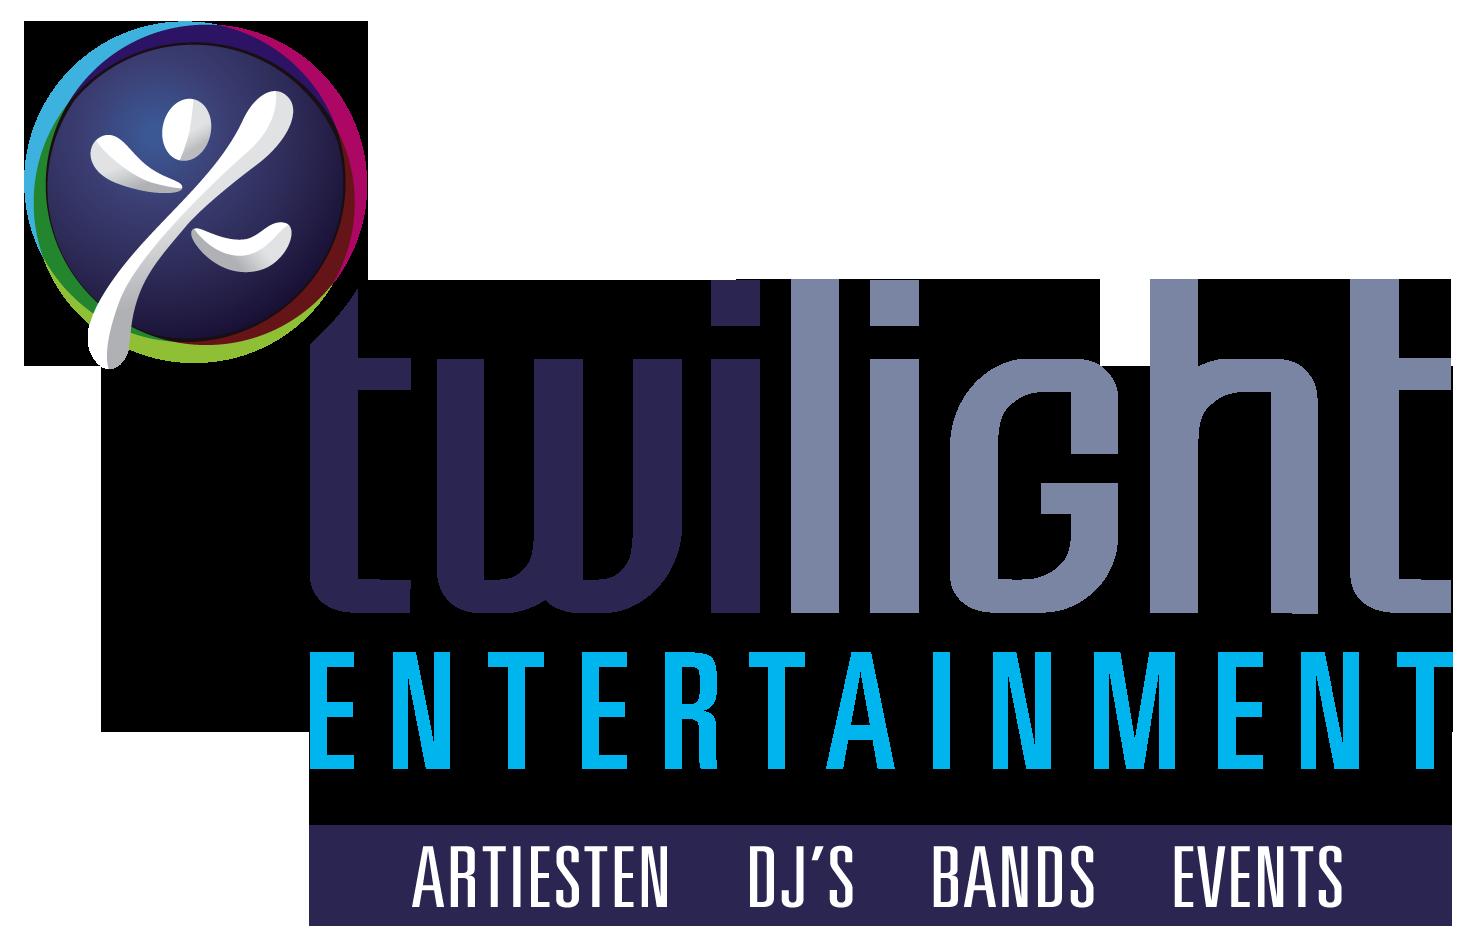 Twilight-logo-01